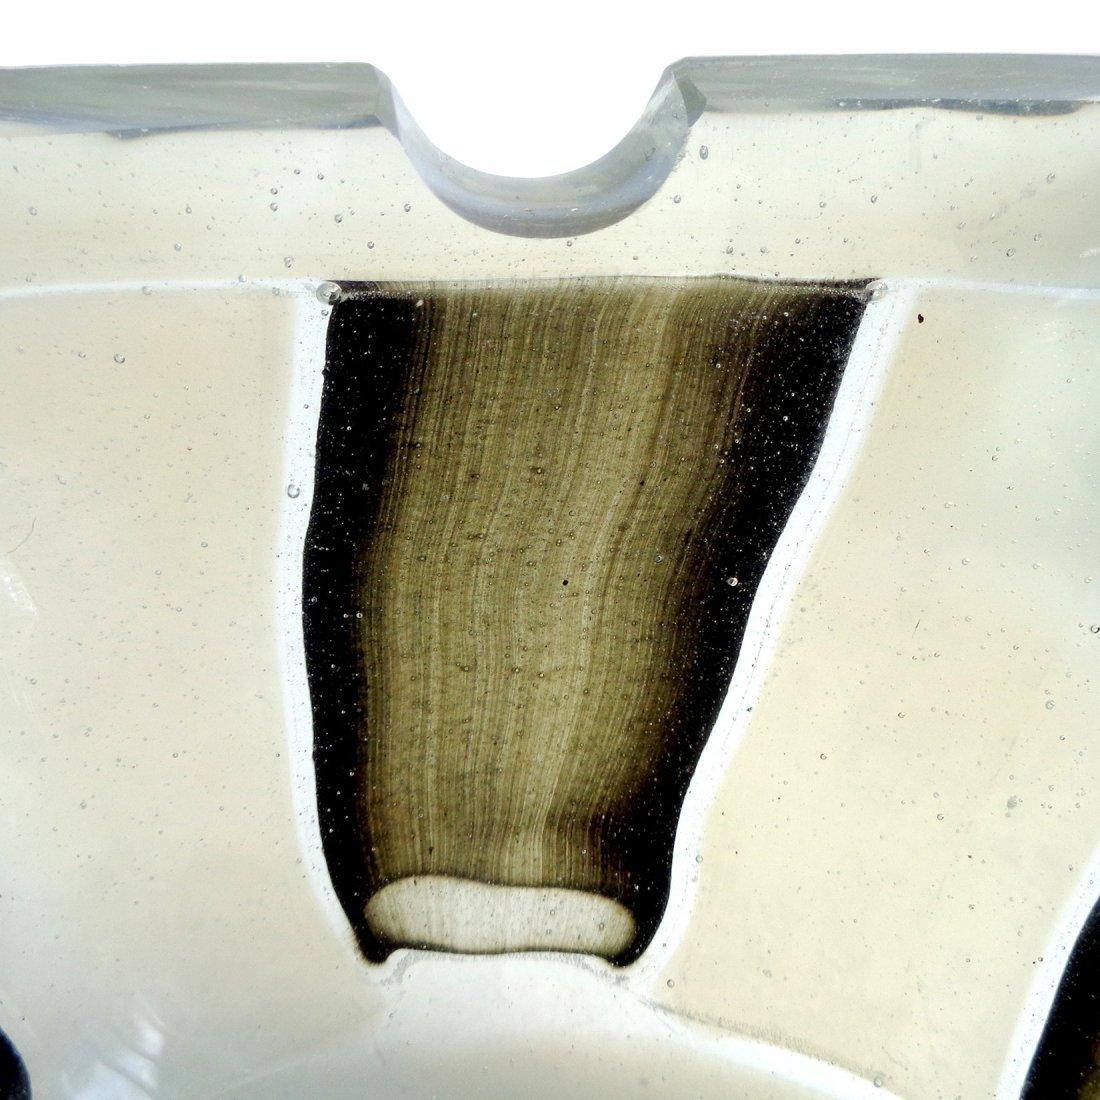 Barovier Toso Murano Opal Pezzato Art Glass Ashtray - 3